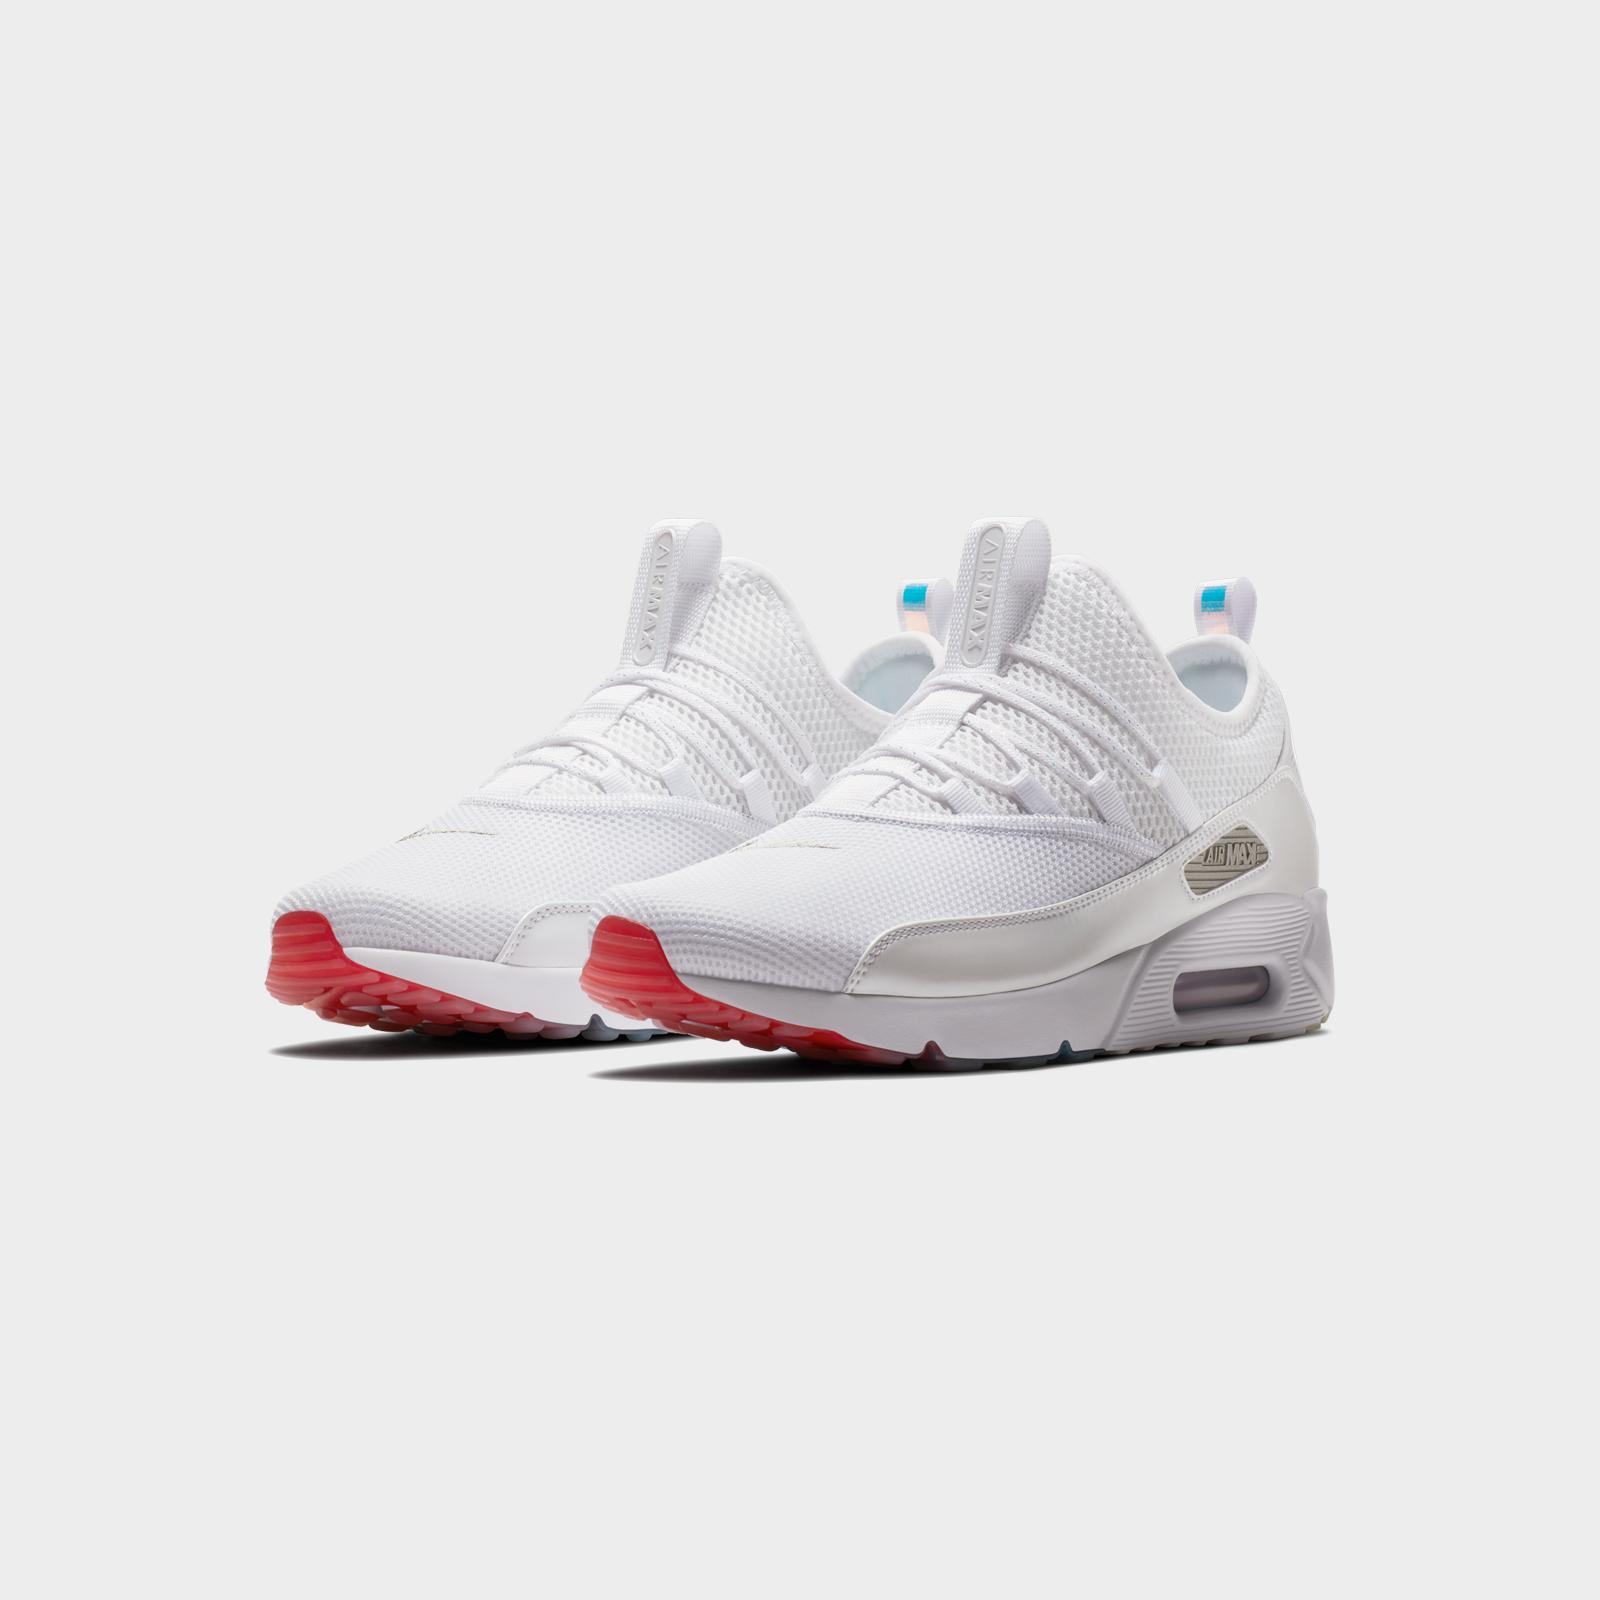 324b6d750c4 Nike Air Max 90 EZ - Aq7980-100 - Sneakersnstuff